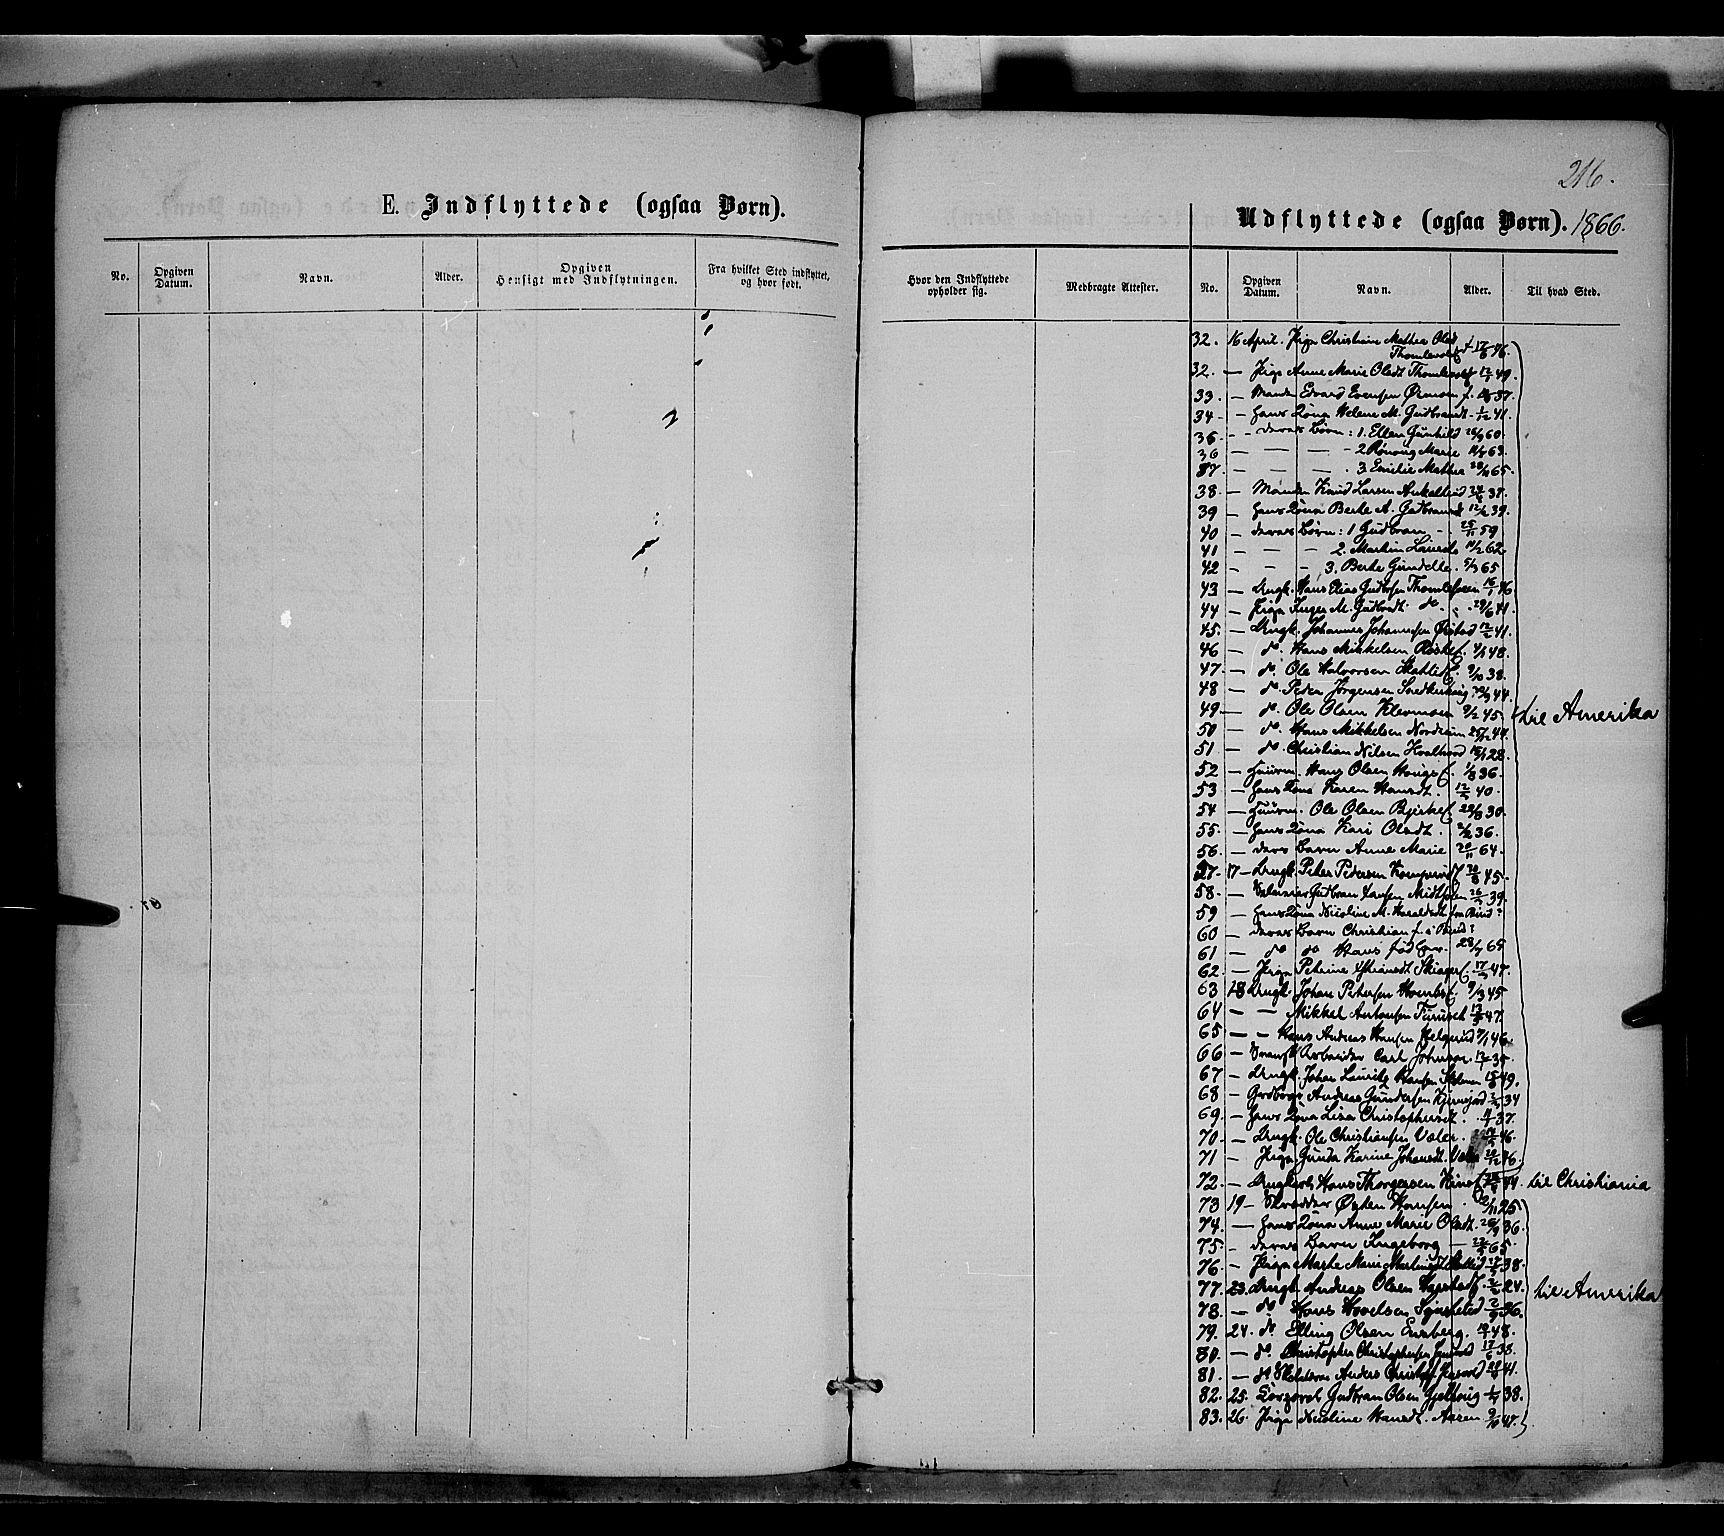 SAH, Nordre Land prestekontor, Ministerialbok nr. 1, 1860-1871, s. 216